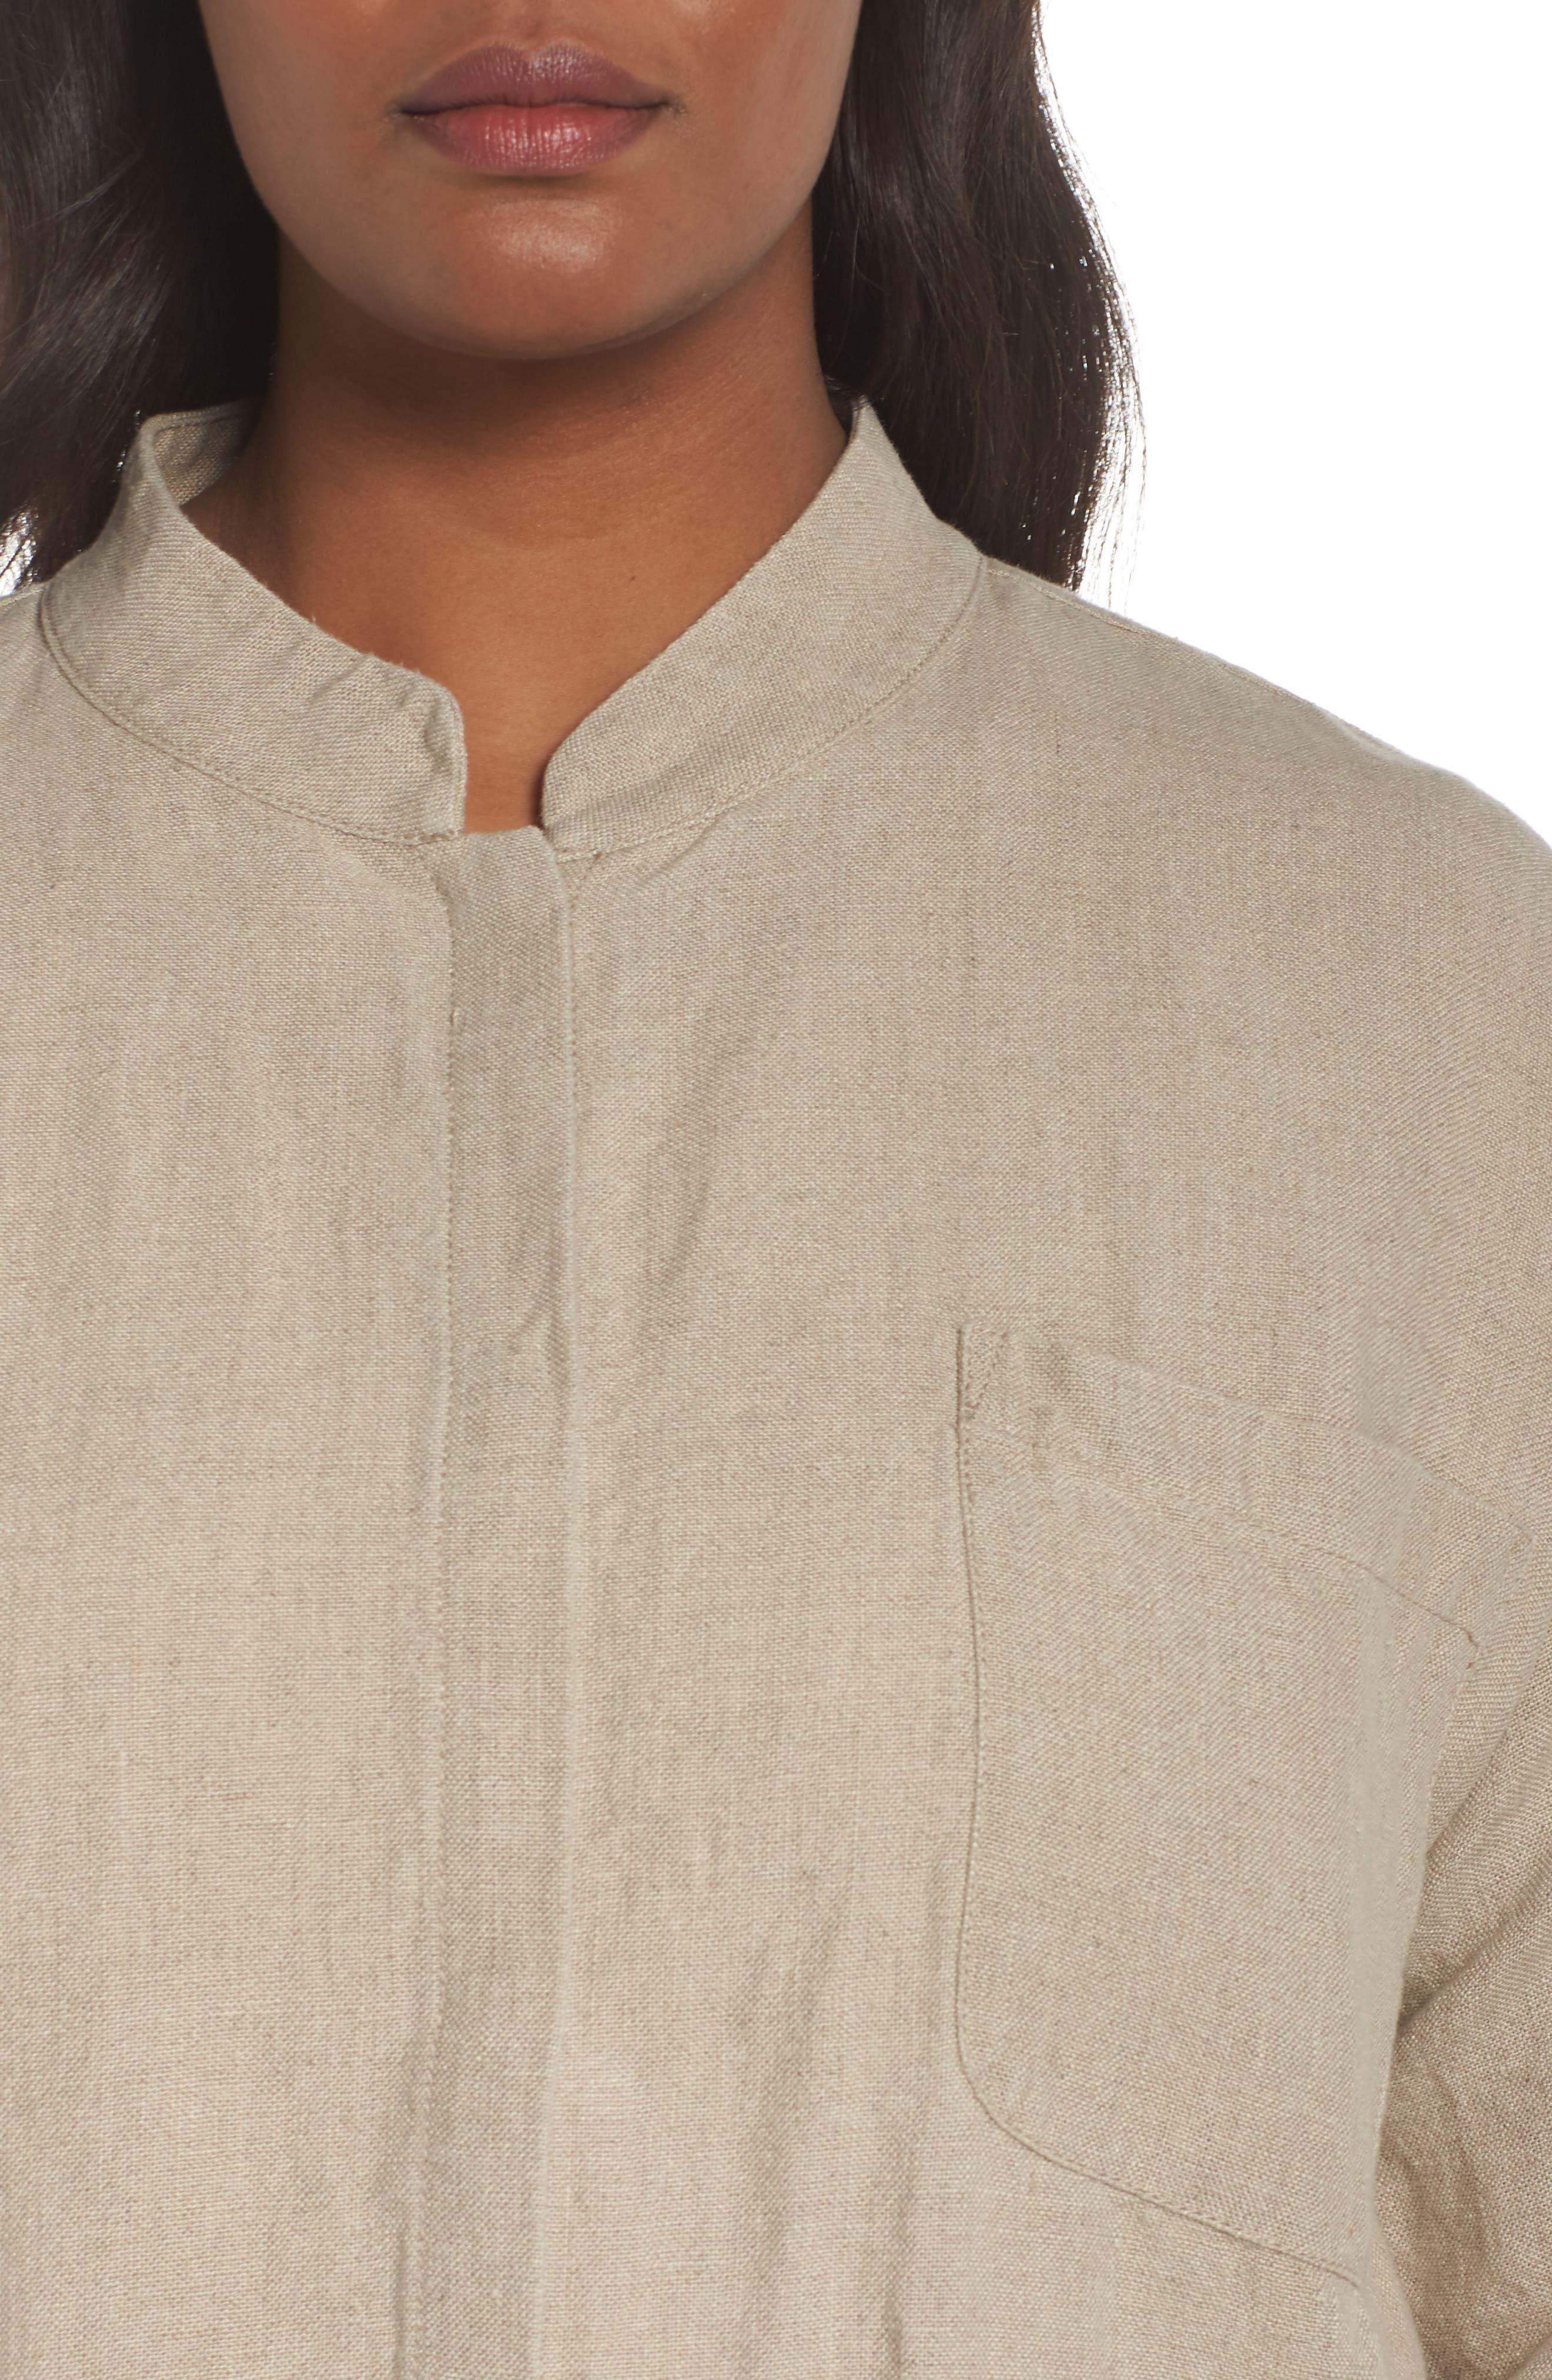 Organic Linen Jacket,                             Alternate thumbnail 4, color,                             251